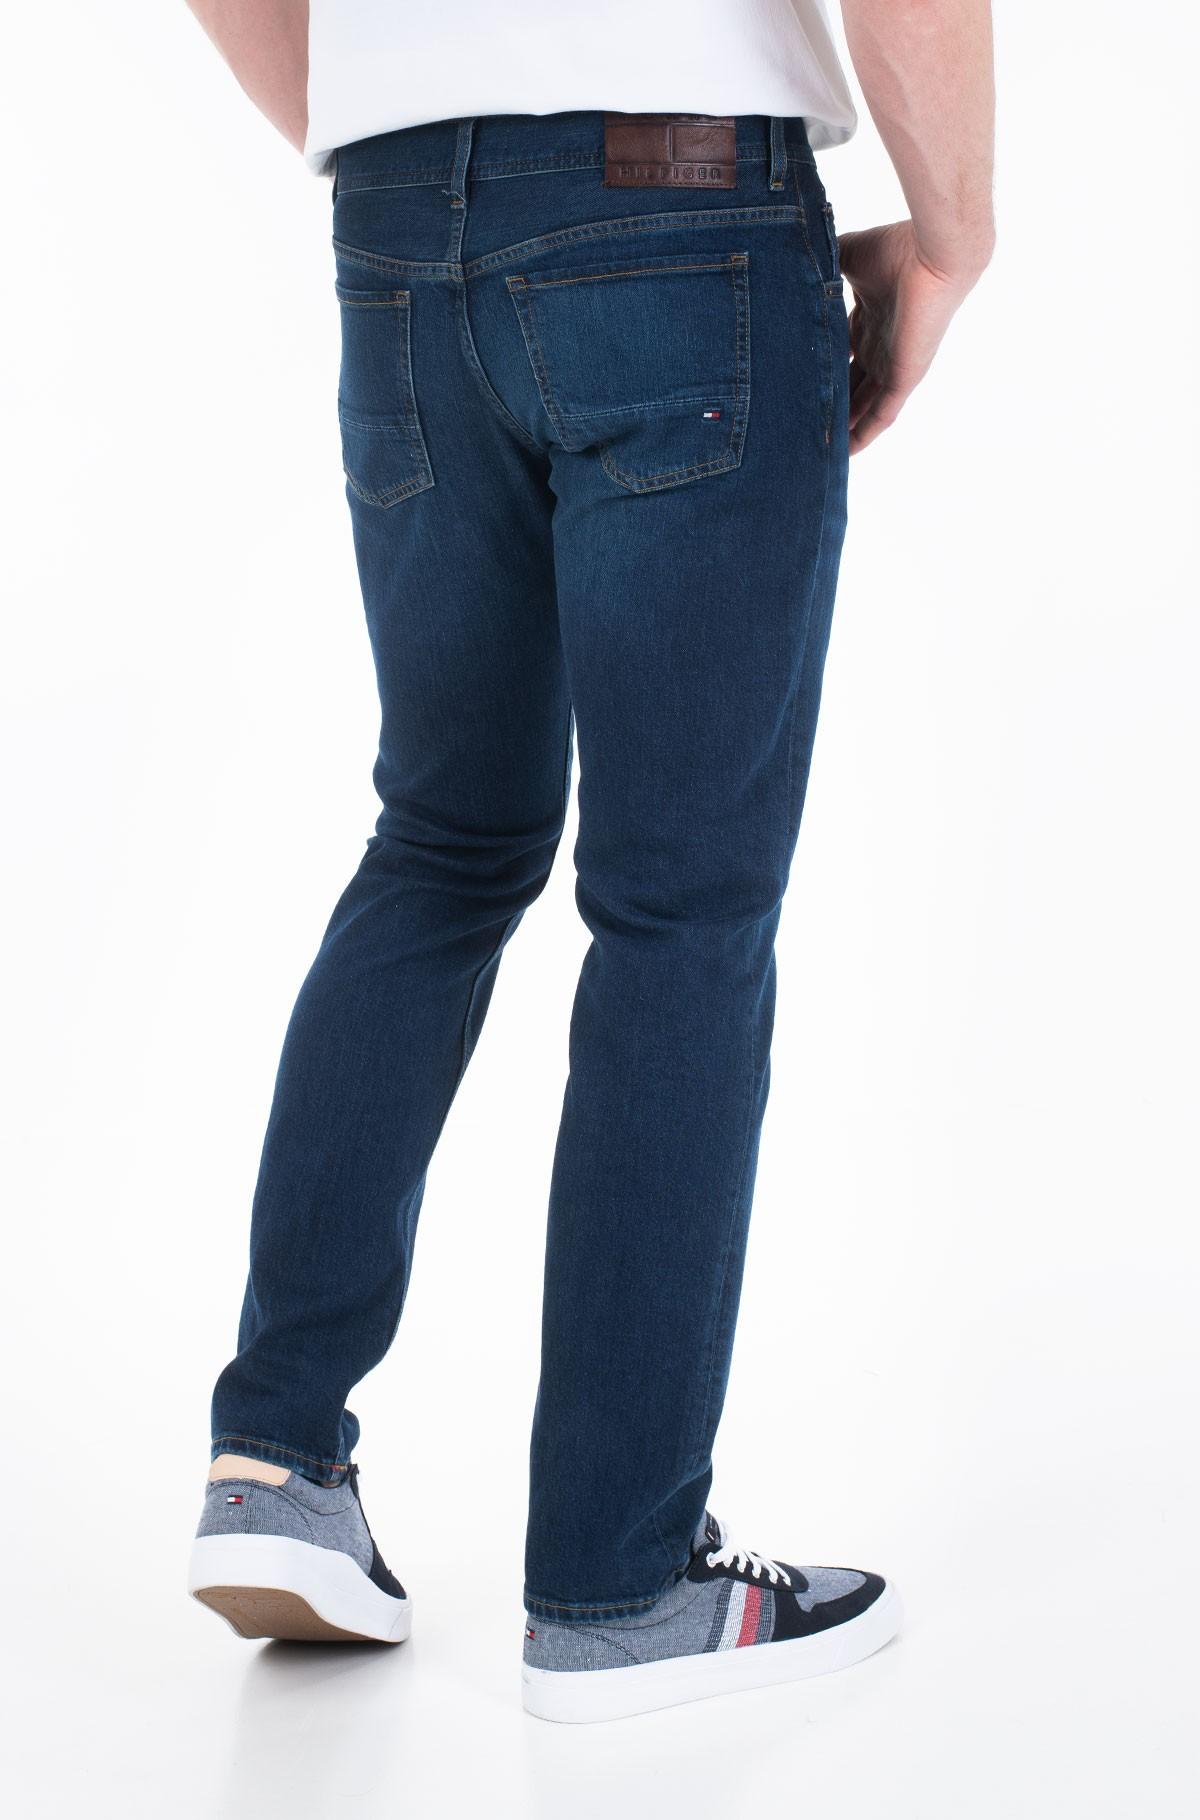 Džinsinės kelnės SLIM BLEECKER STR BOWIE BLUE-full-2